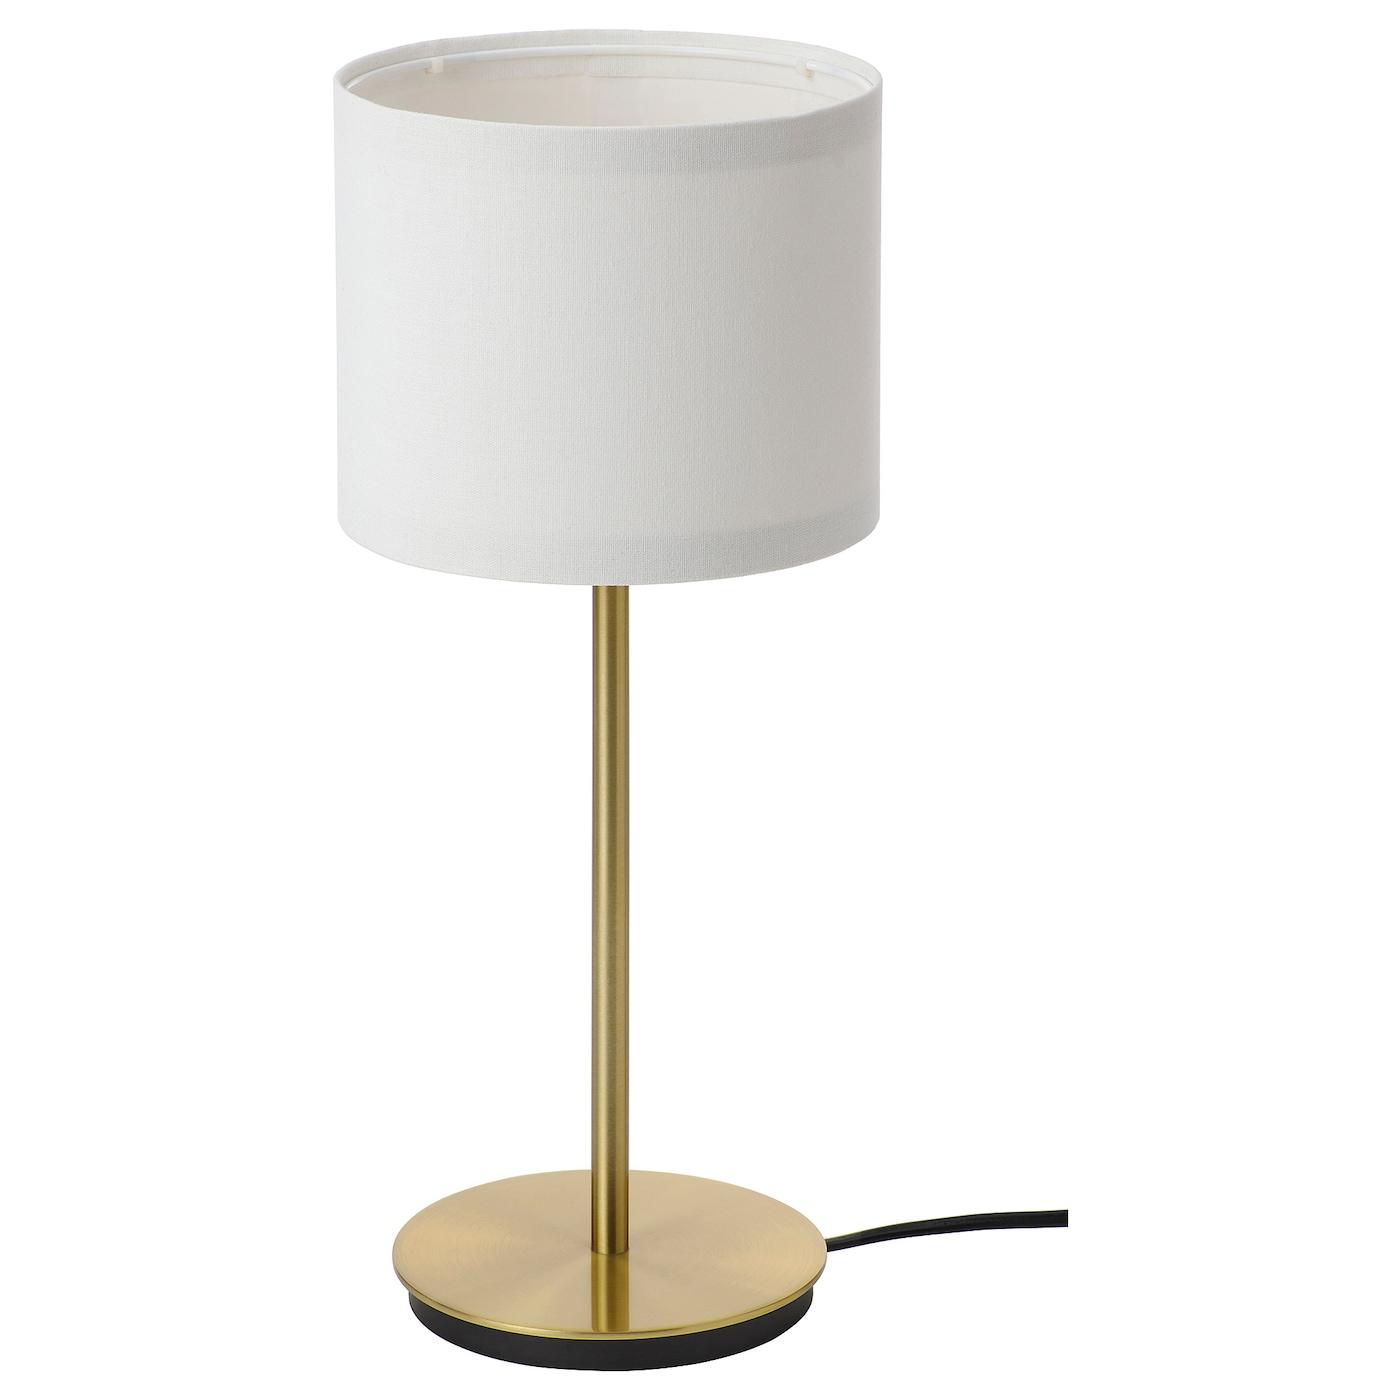 Bordlampe Lamper i mange design IKEA